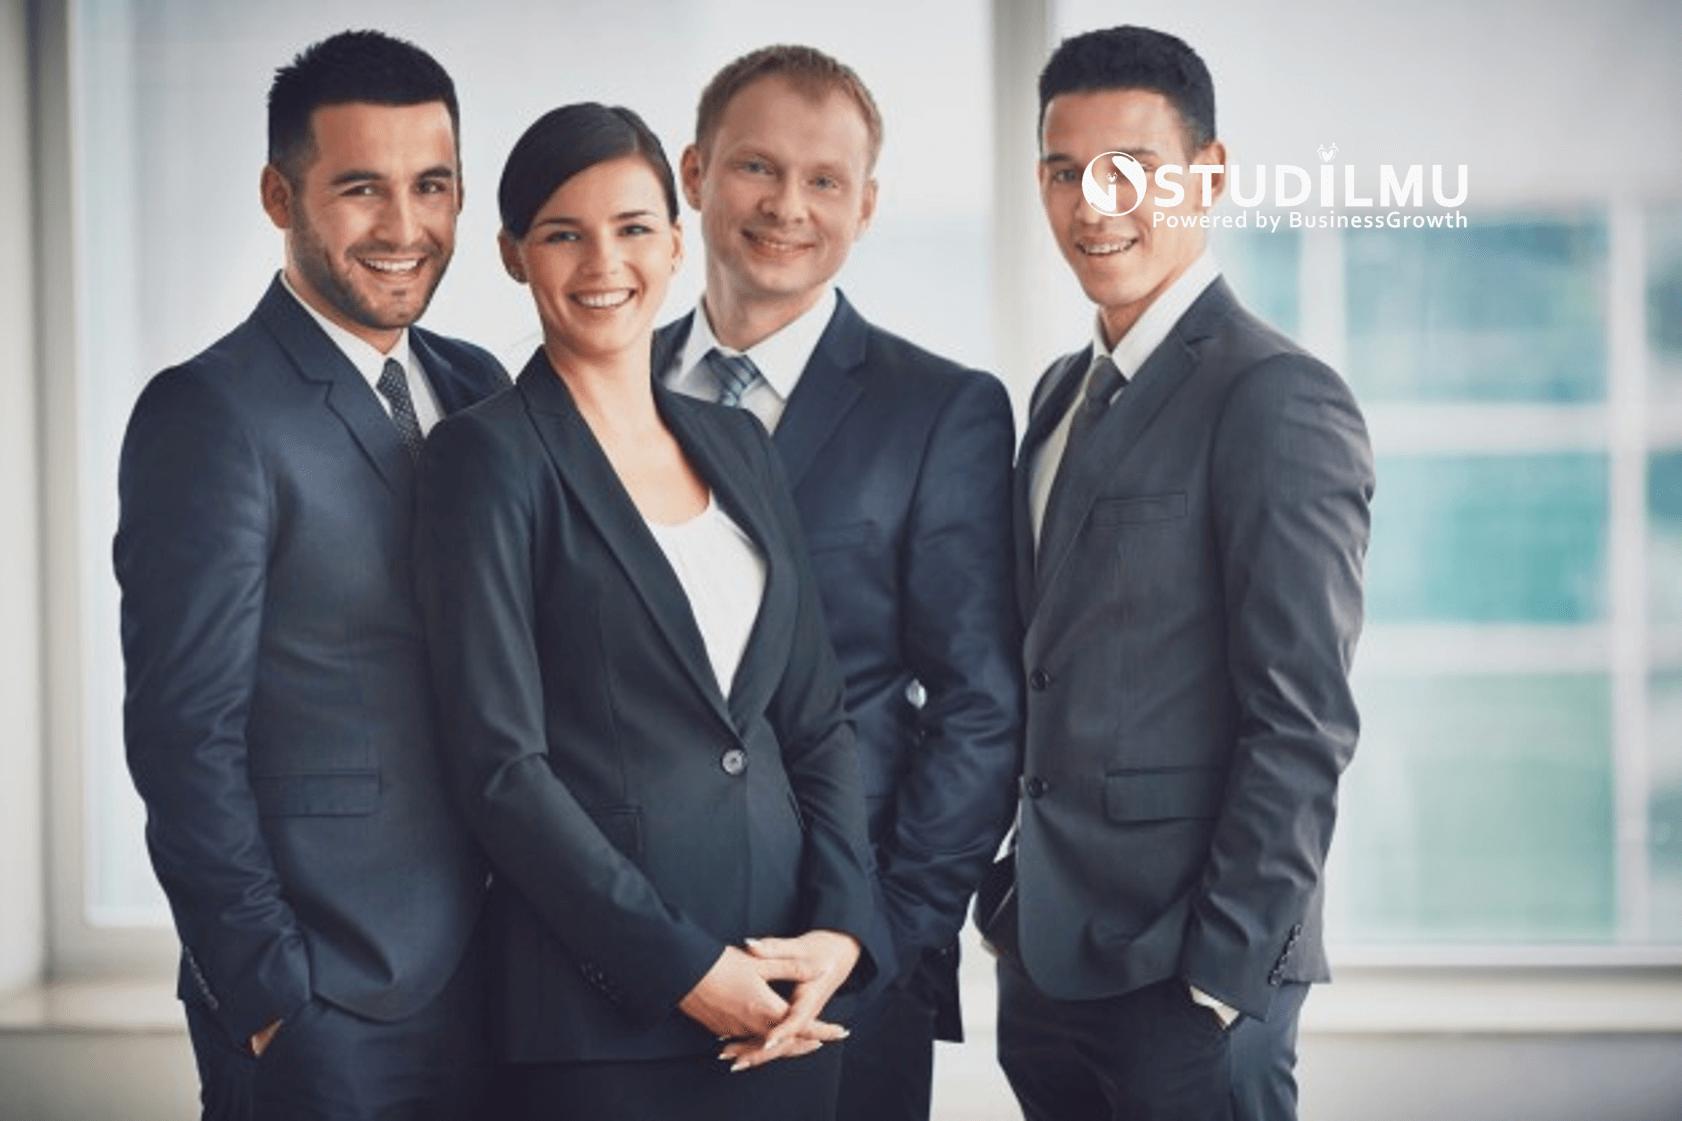 STUDILMU Career Advice - Pengertian Kepemimpinan secara Umum dan 6 Jenis Kepemimpinan